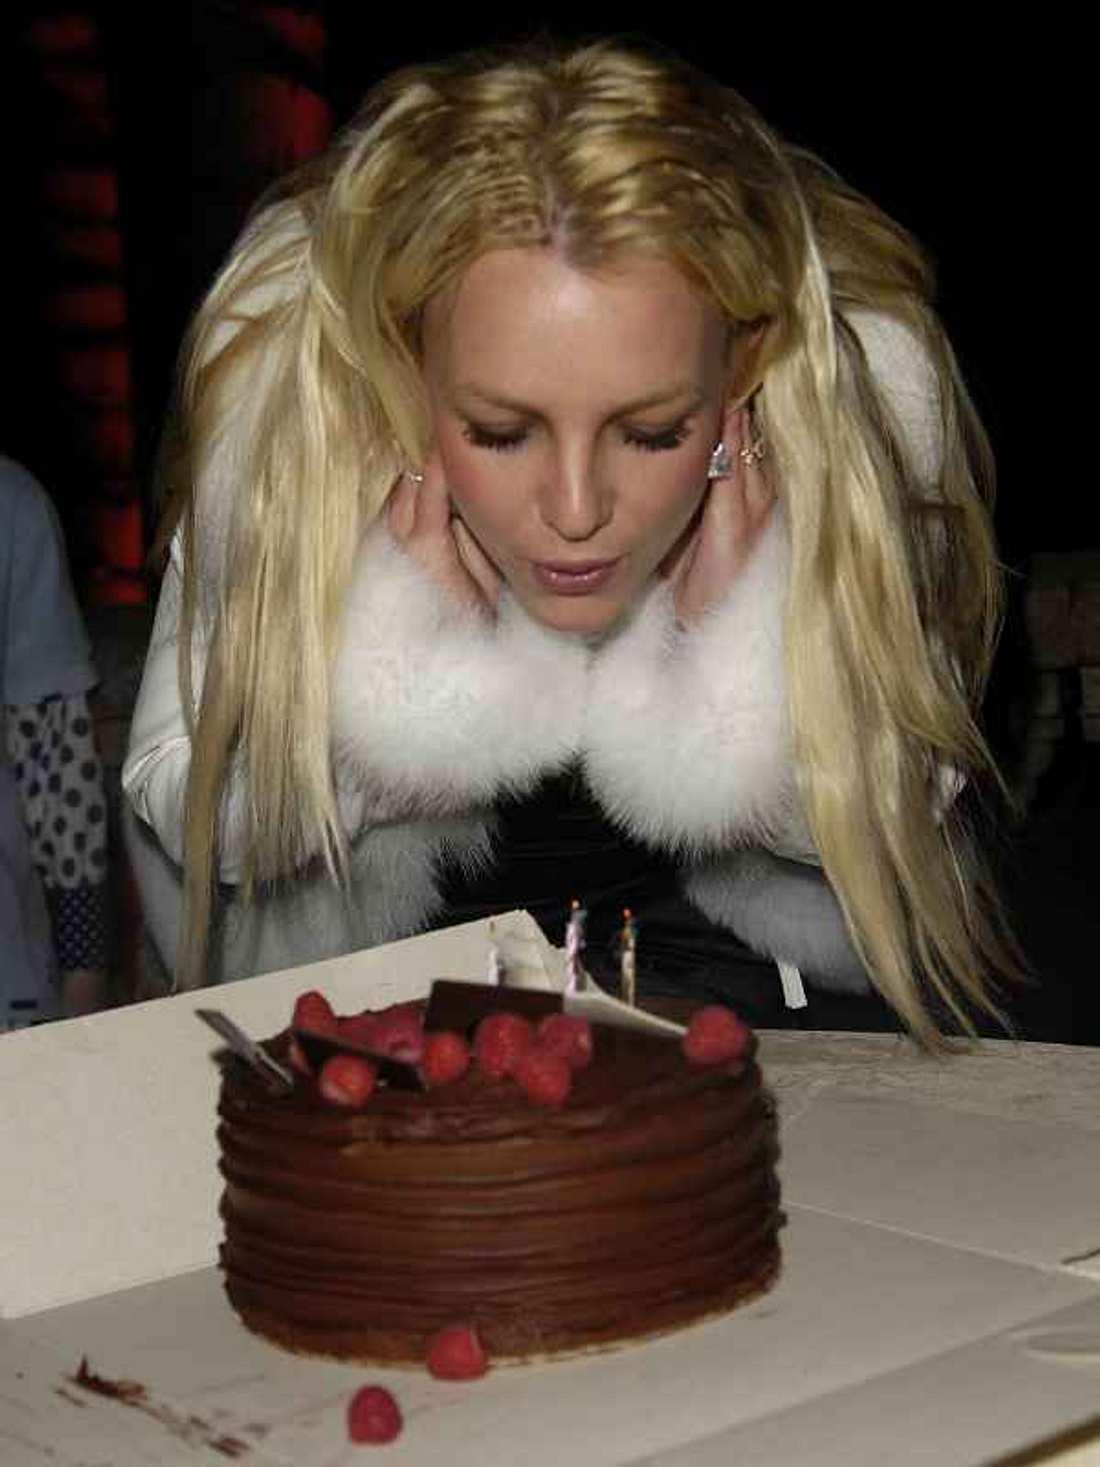 The Best Of ... Britney Spears - Bild 1